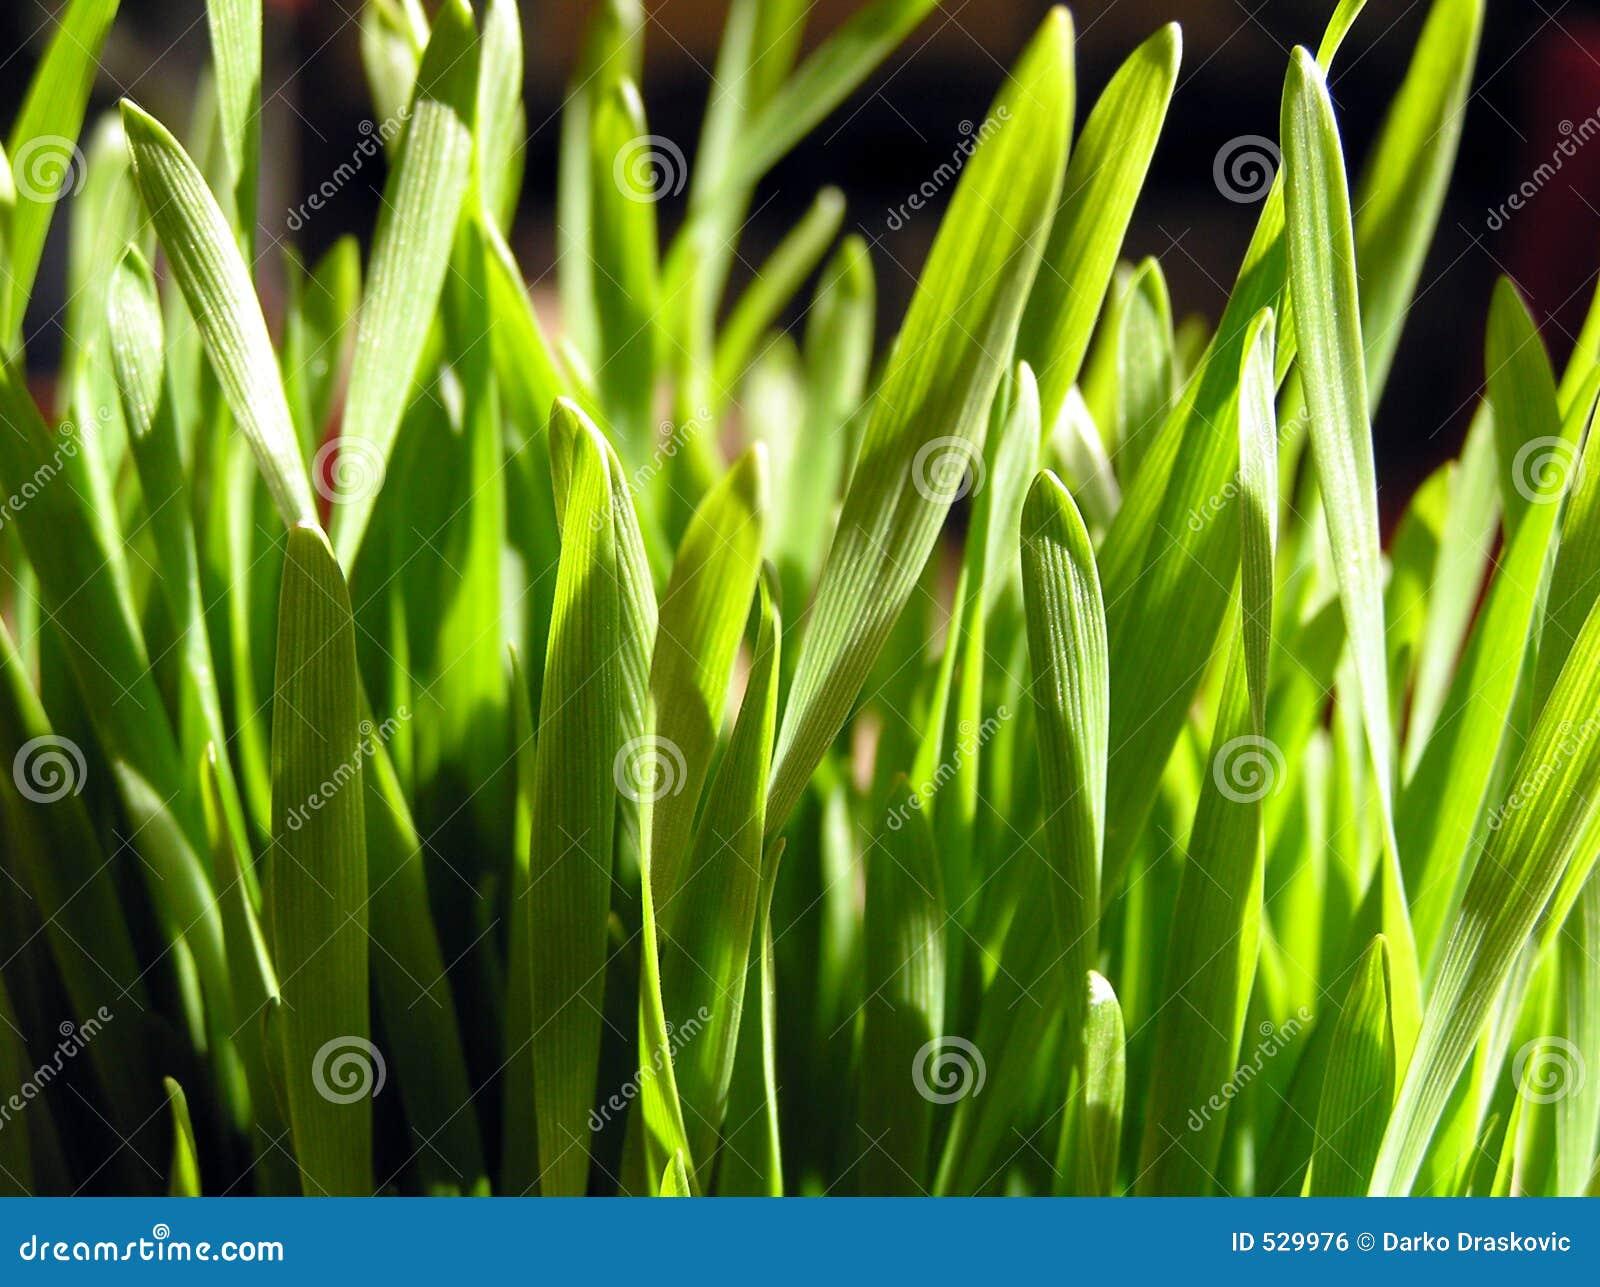 Download 麦子 库存照片. 图片 包括有 自然, 叶子, 绿色, 农场, 庭院, 健康, 绿叶素, 麦子, 有机, 食物 - 529976